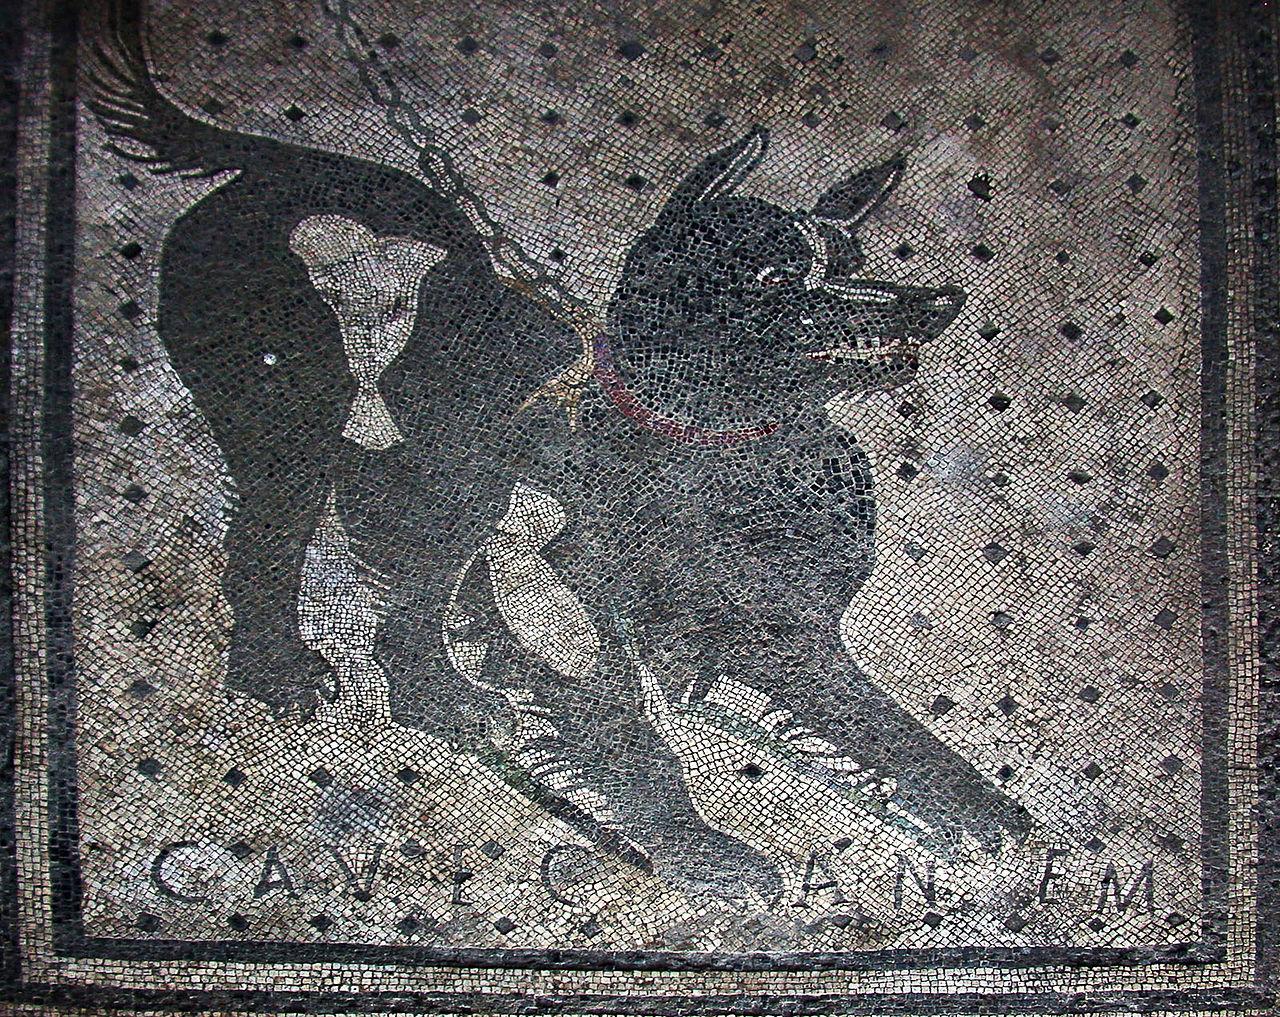 https://upload.wikimedia.org/wikipedia/commons/thumb/a/a5/Pompeii_-_Cave_Canem_%284786638740%29.jpg/1280px-Pompeii_-_Cave_Canem_%284786638740%29.jpg